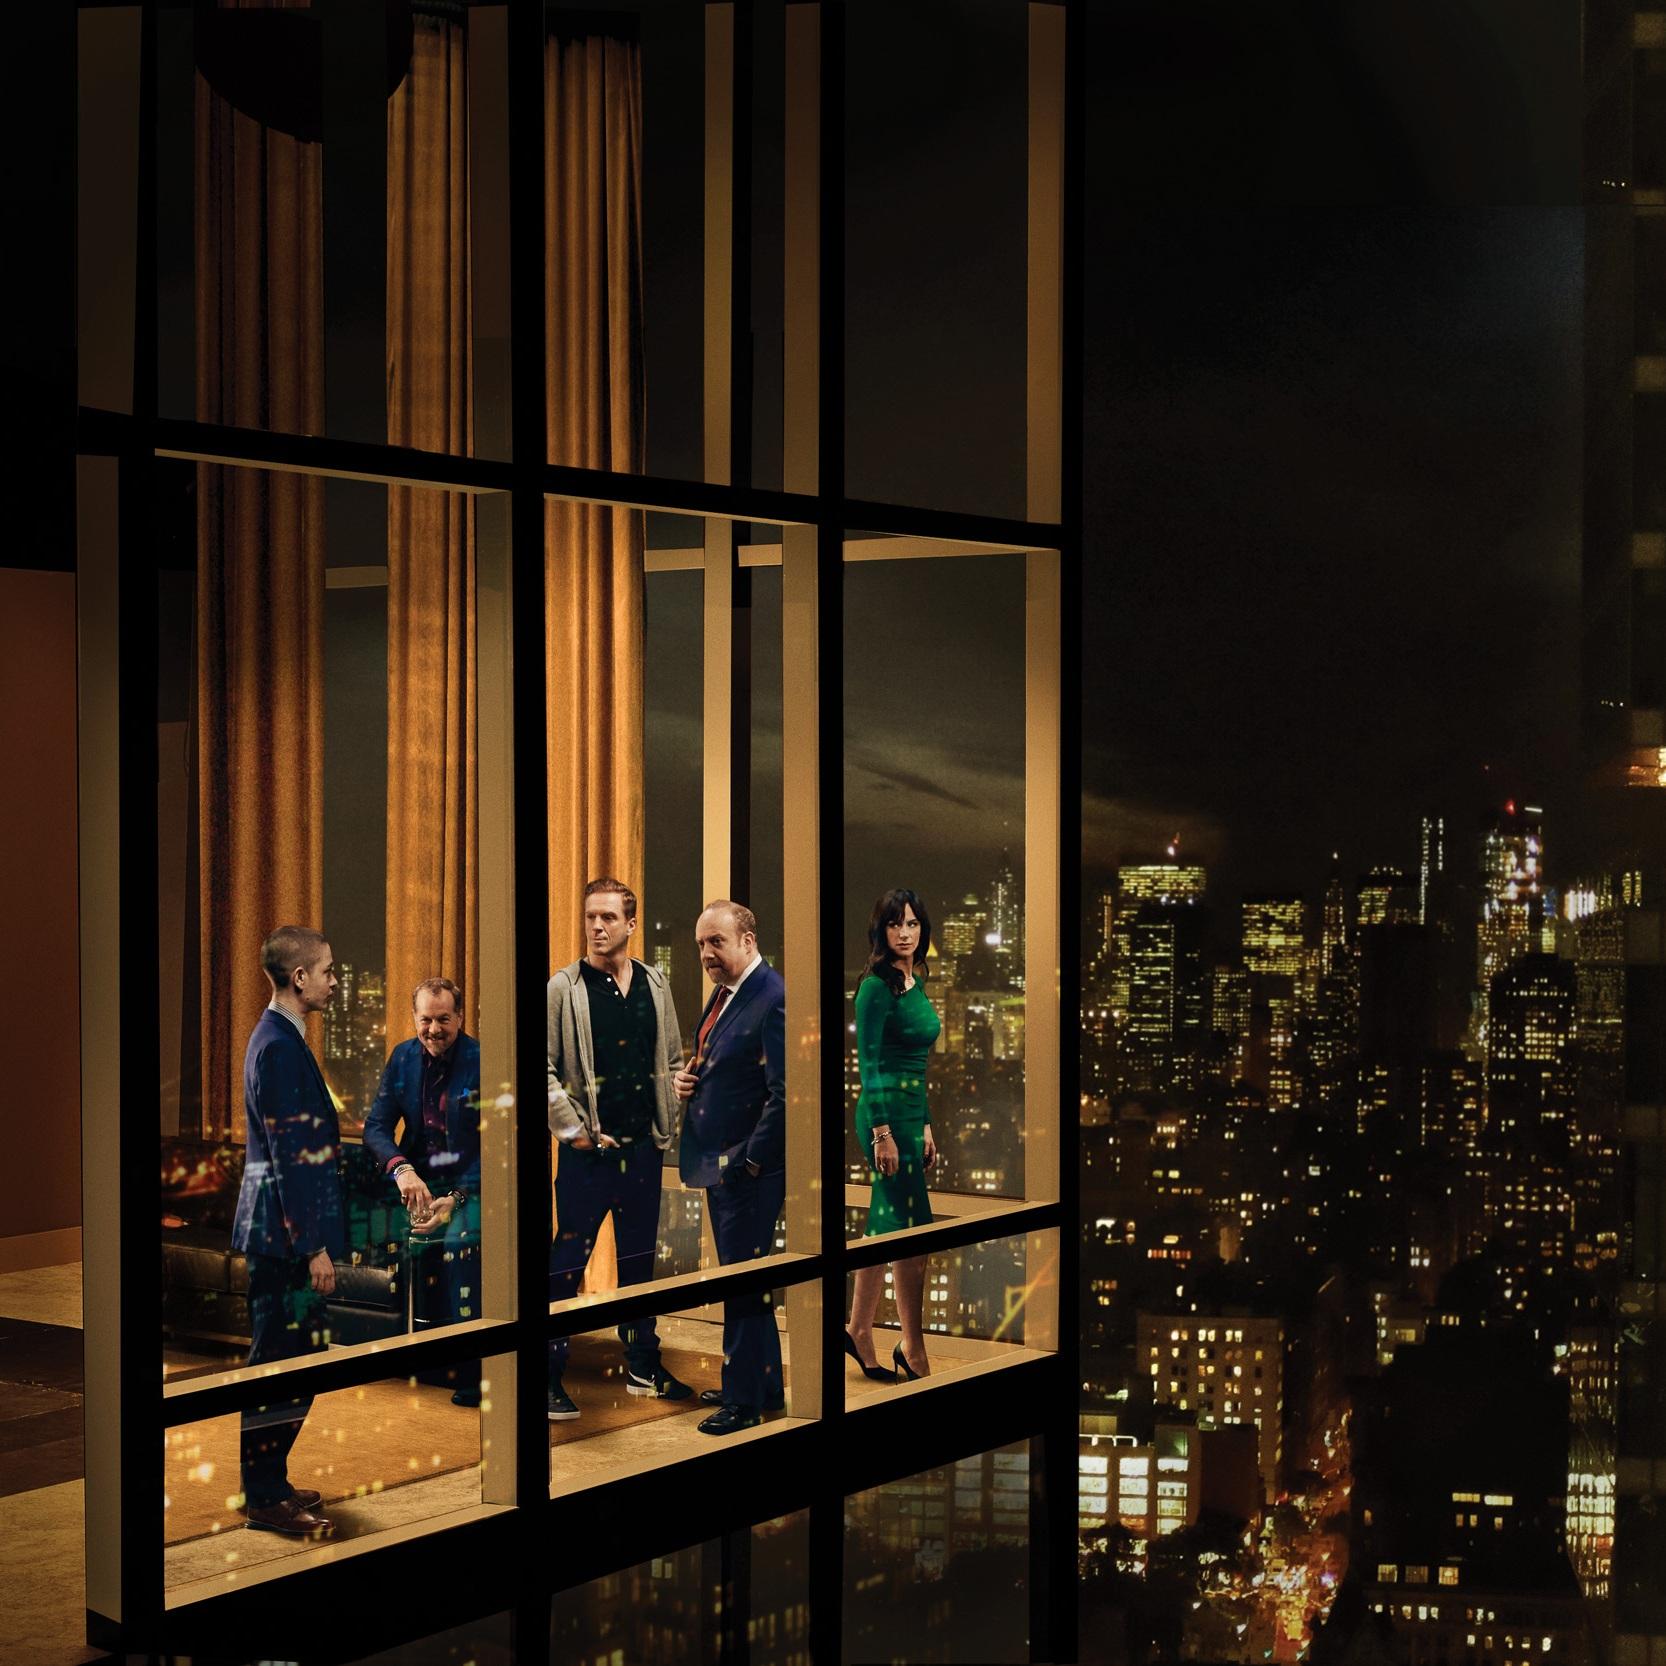 Billions - Client: ShowtimeLocation: New York, New YorkPhotographer: Marc Hom